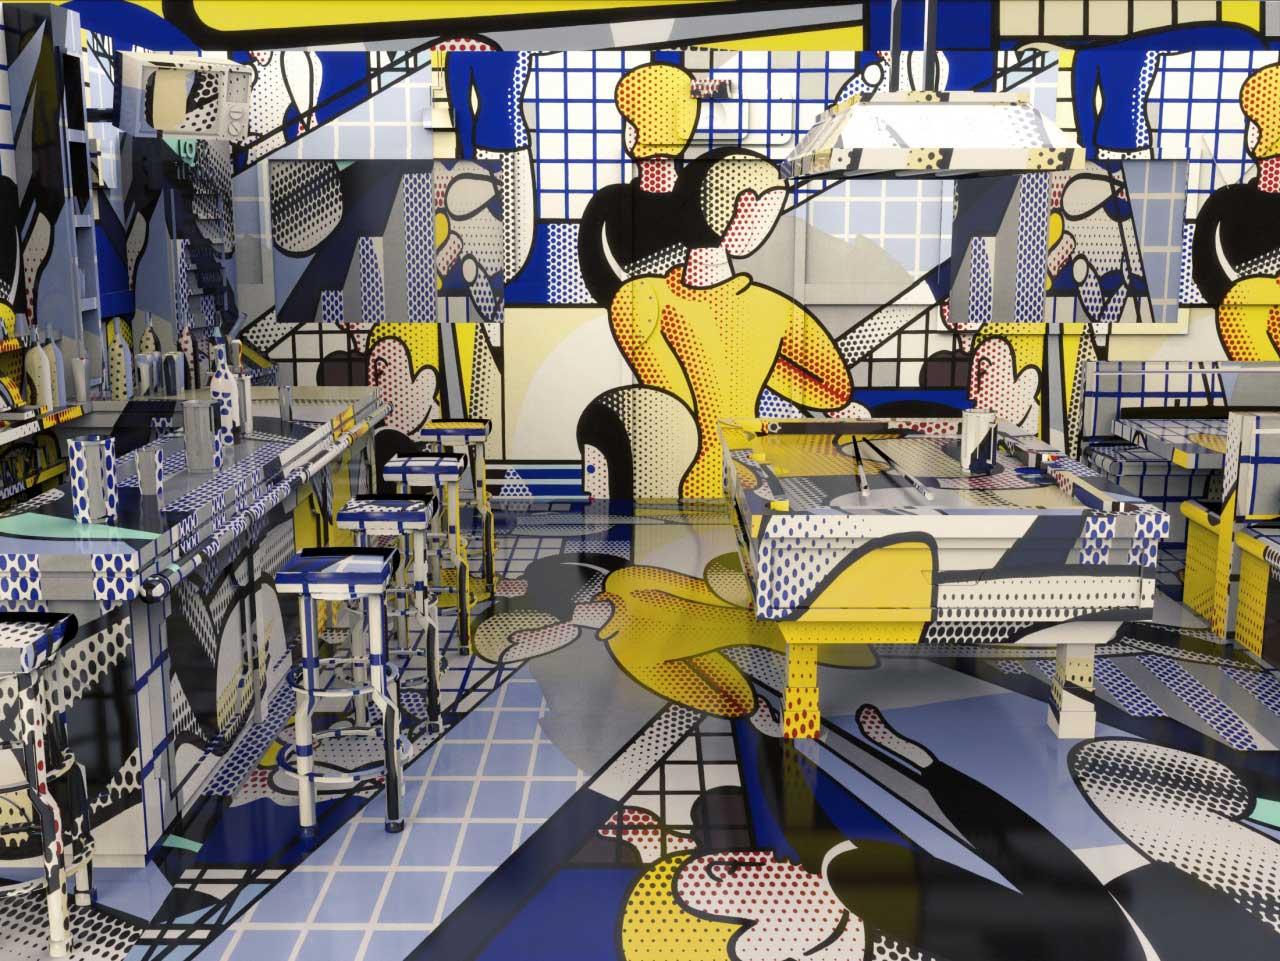 Jon Rafman Brand New Paint Job / Artist wrapped rooms by Jon Rafman overlay interiors | Yellowtrace